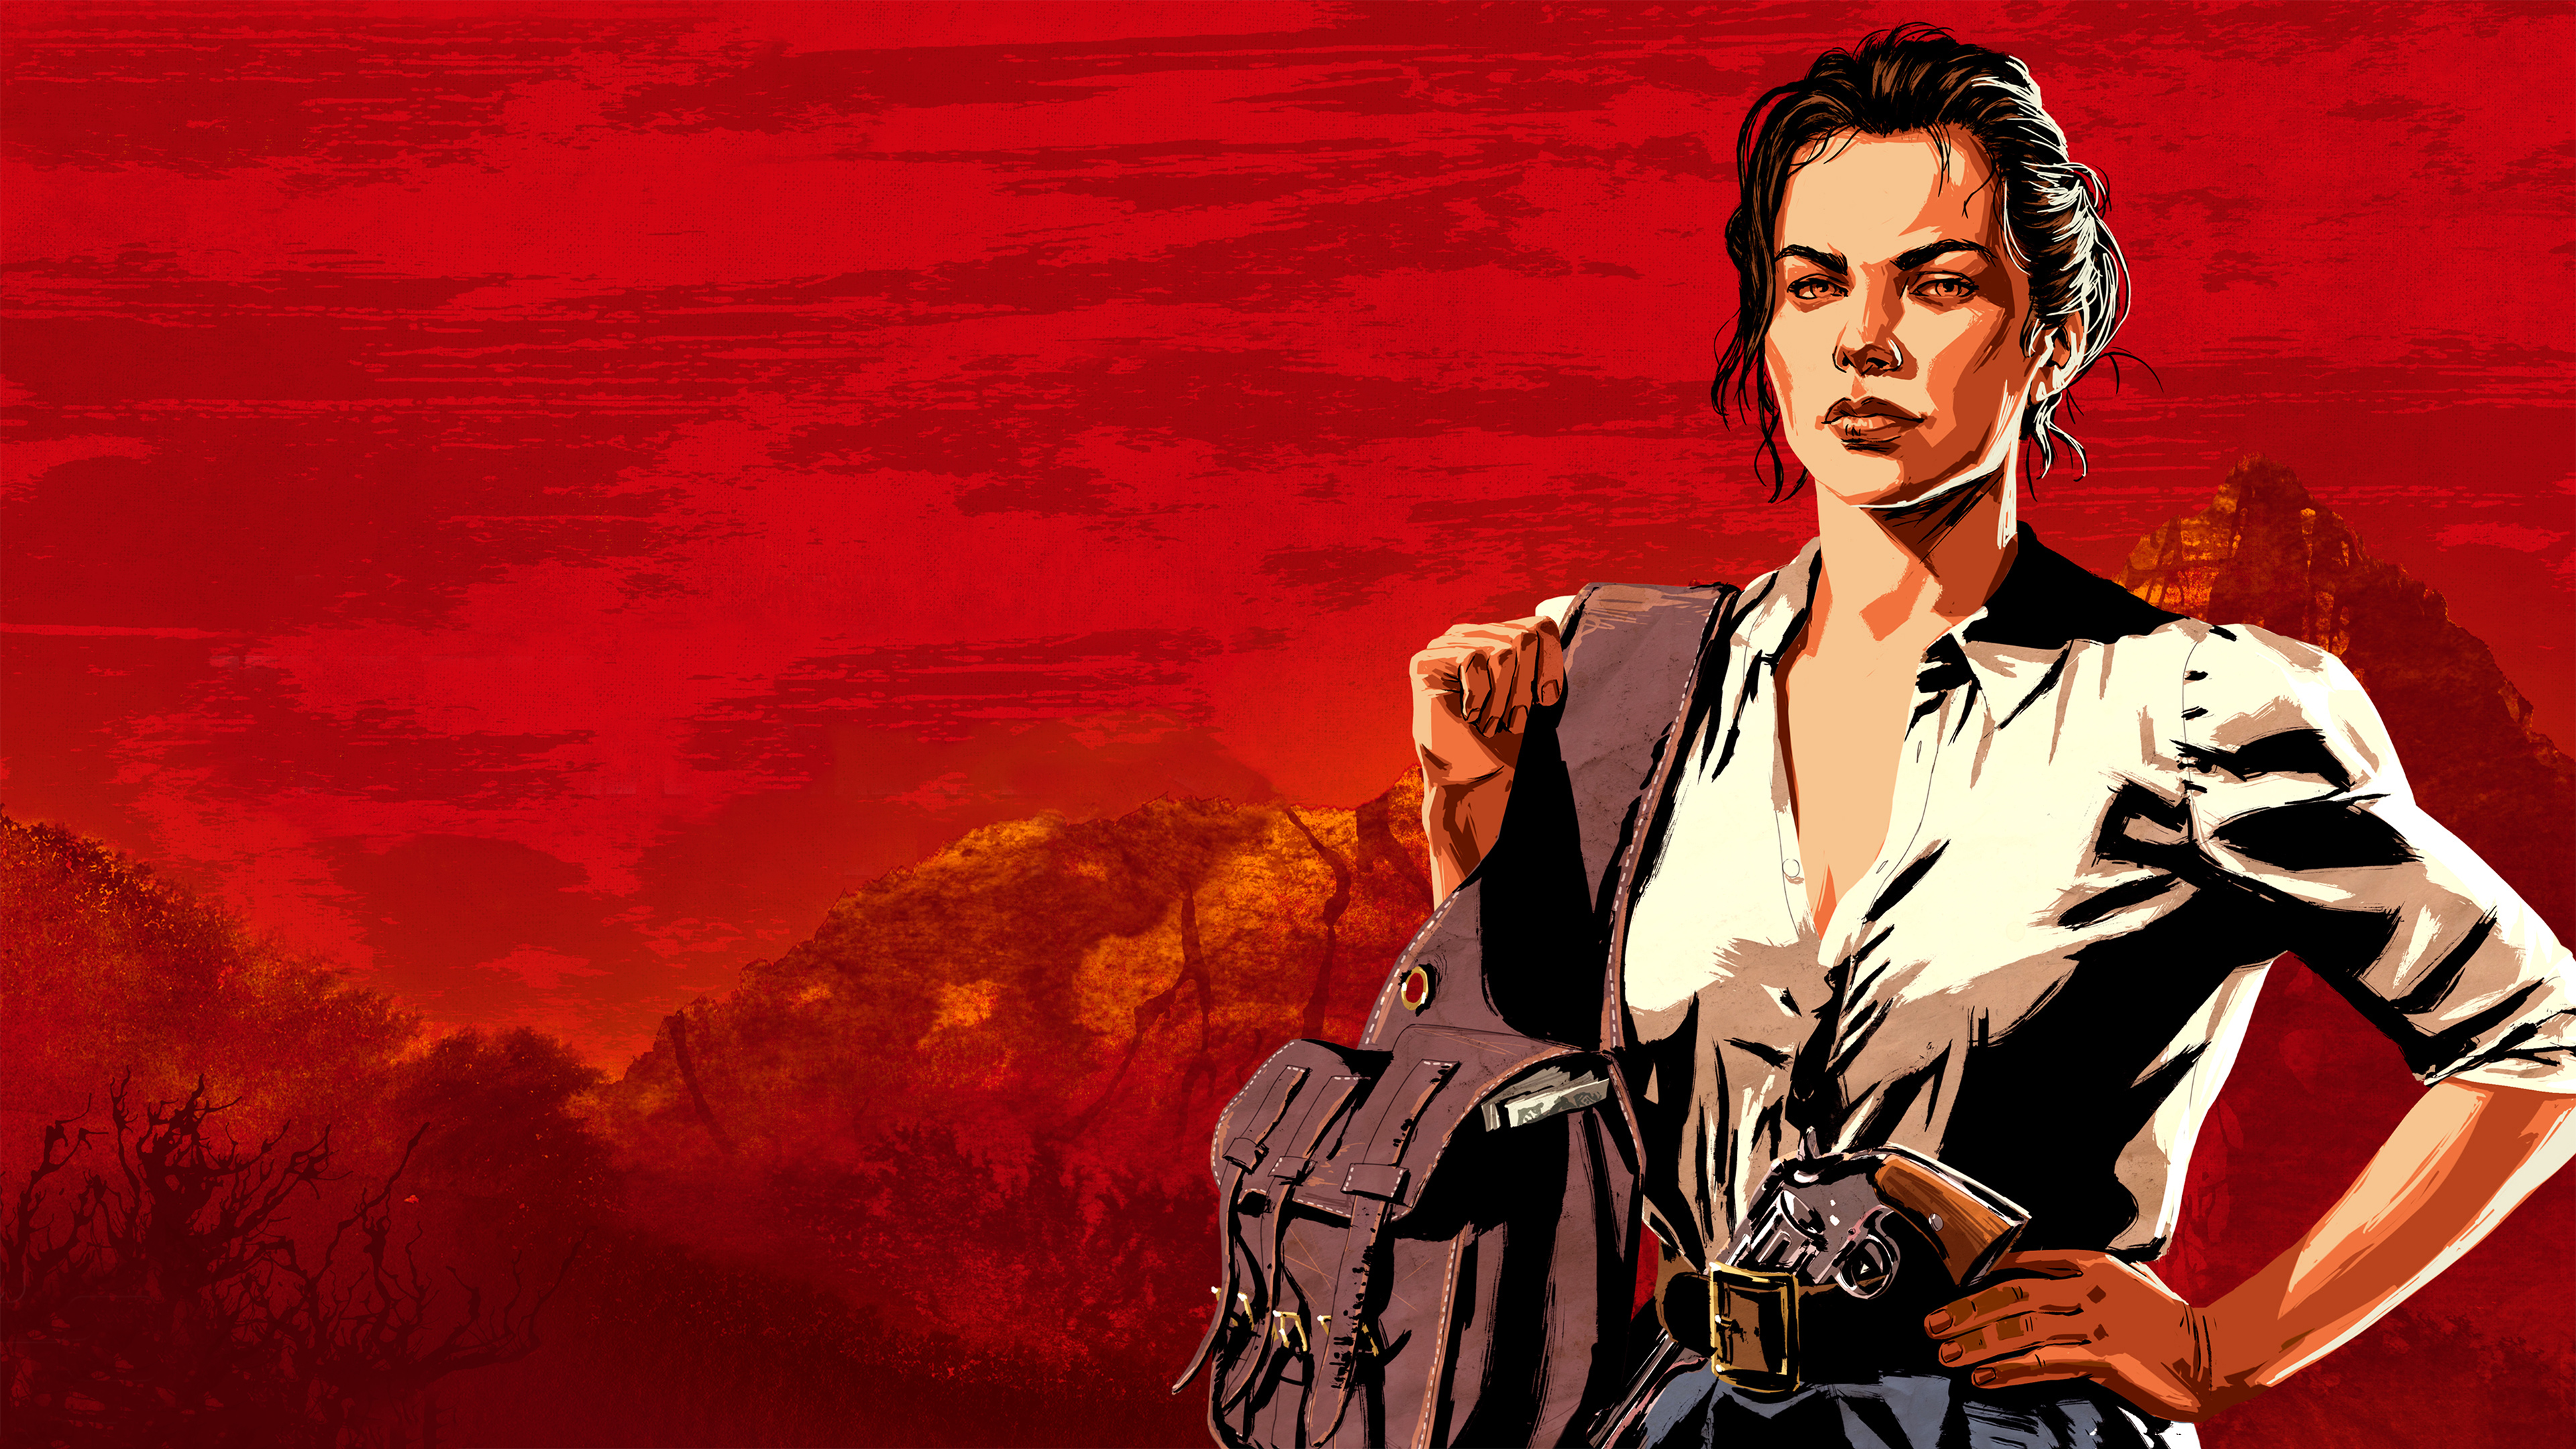 2018 Red Dead Redemption 2 4k Hd Games 4k Wallpapers Images